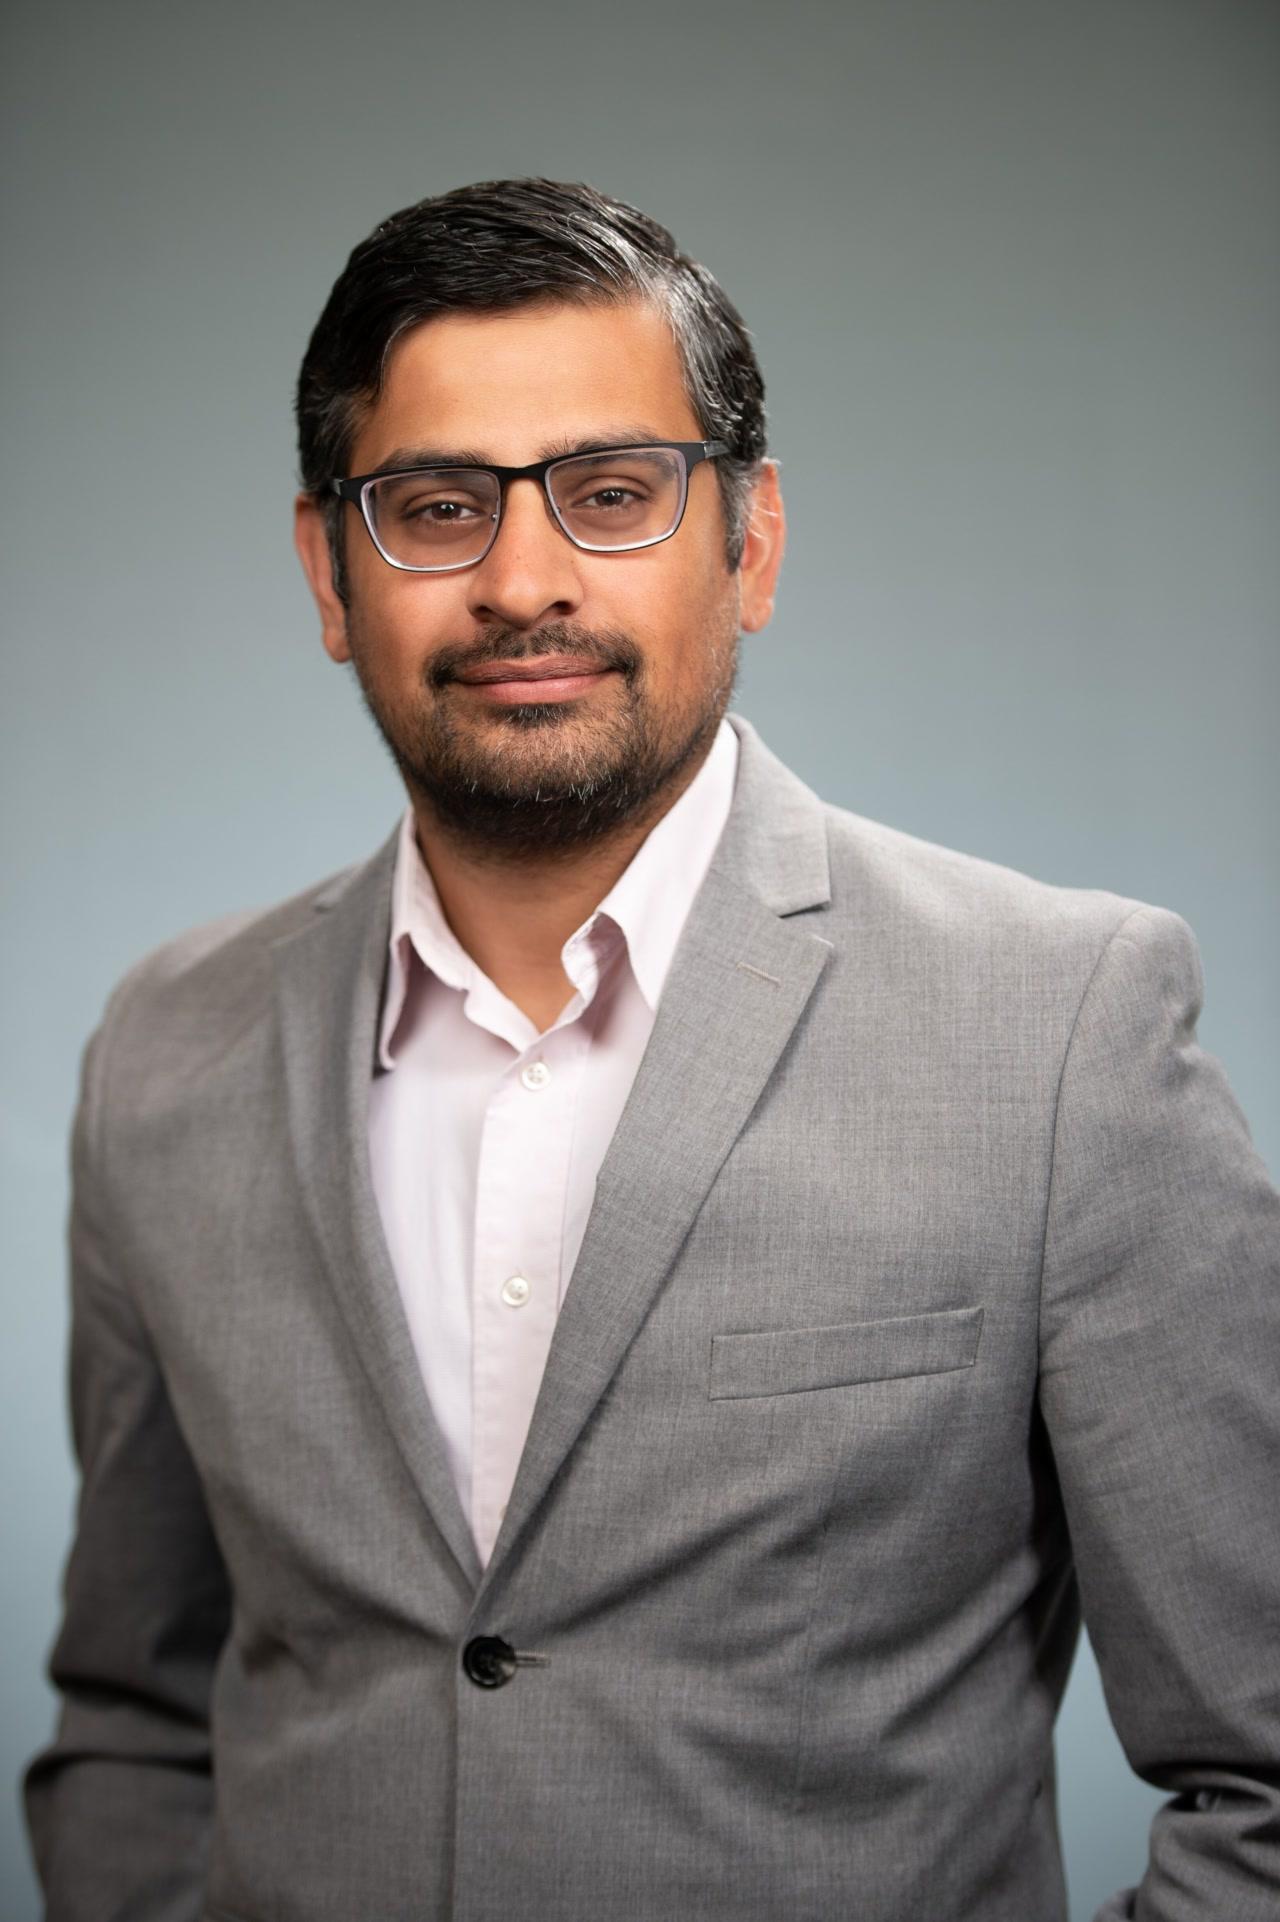 Raghavan Nagarajan portrait